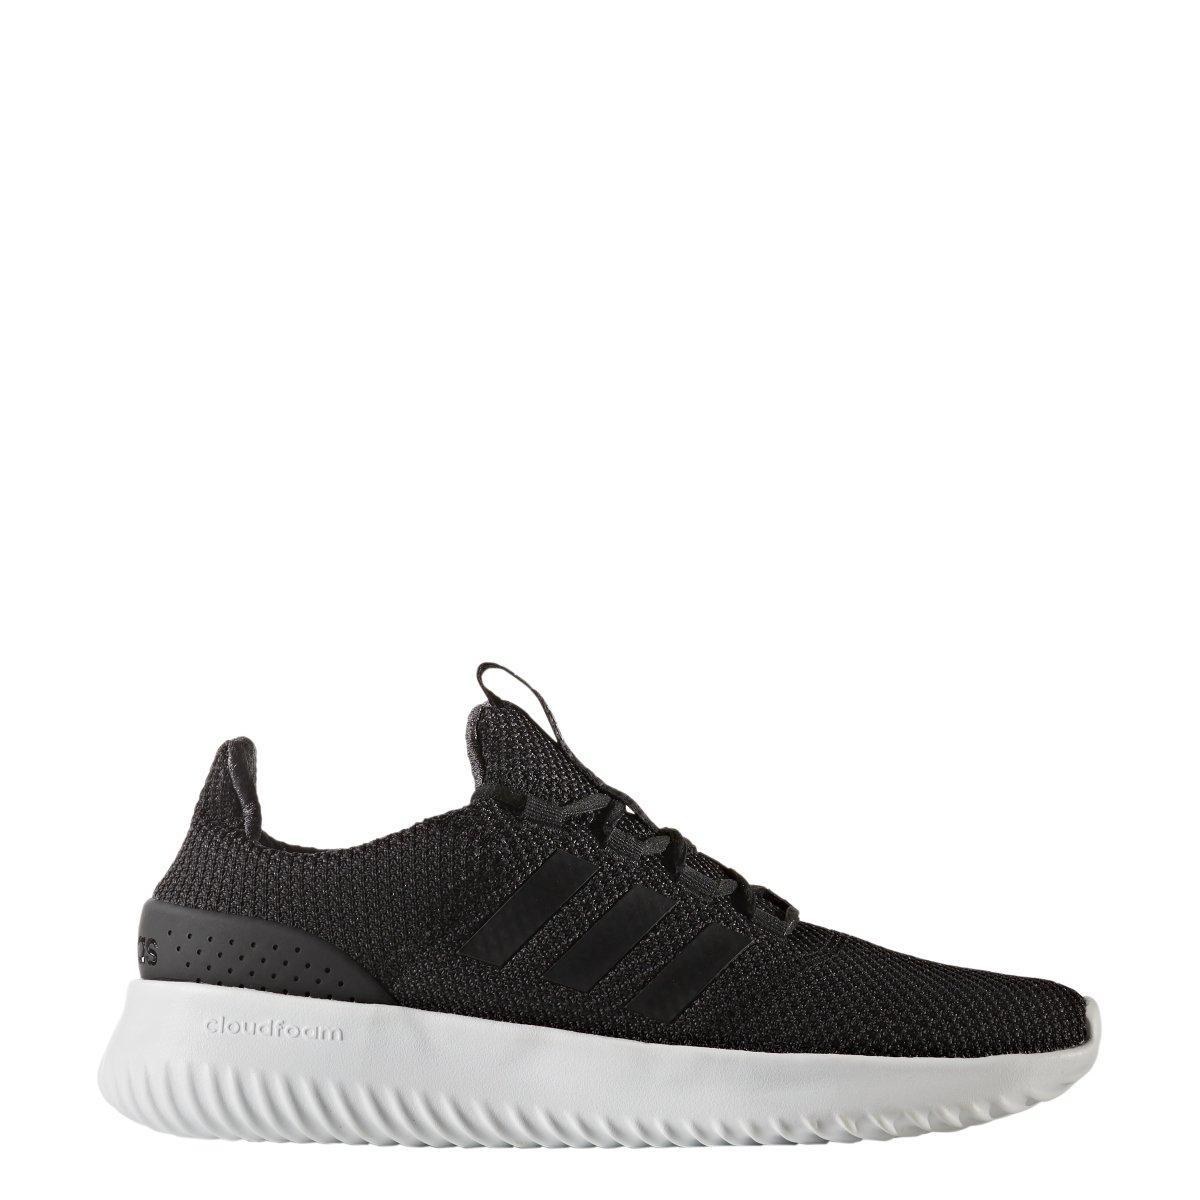 adidas Men's Cloudfoam Ultimate Running Shoe White/Utility Black, 4.5 Medium US